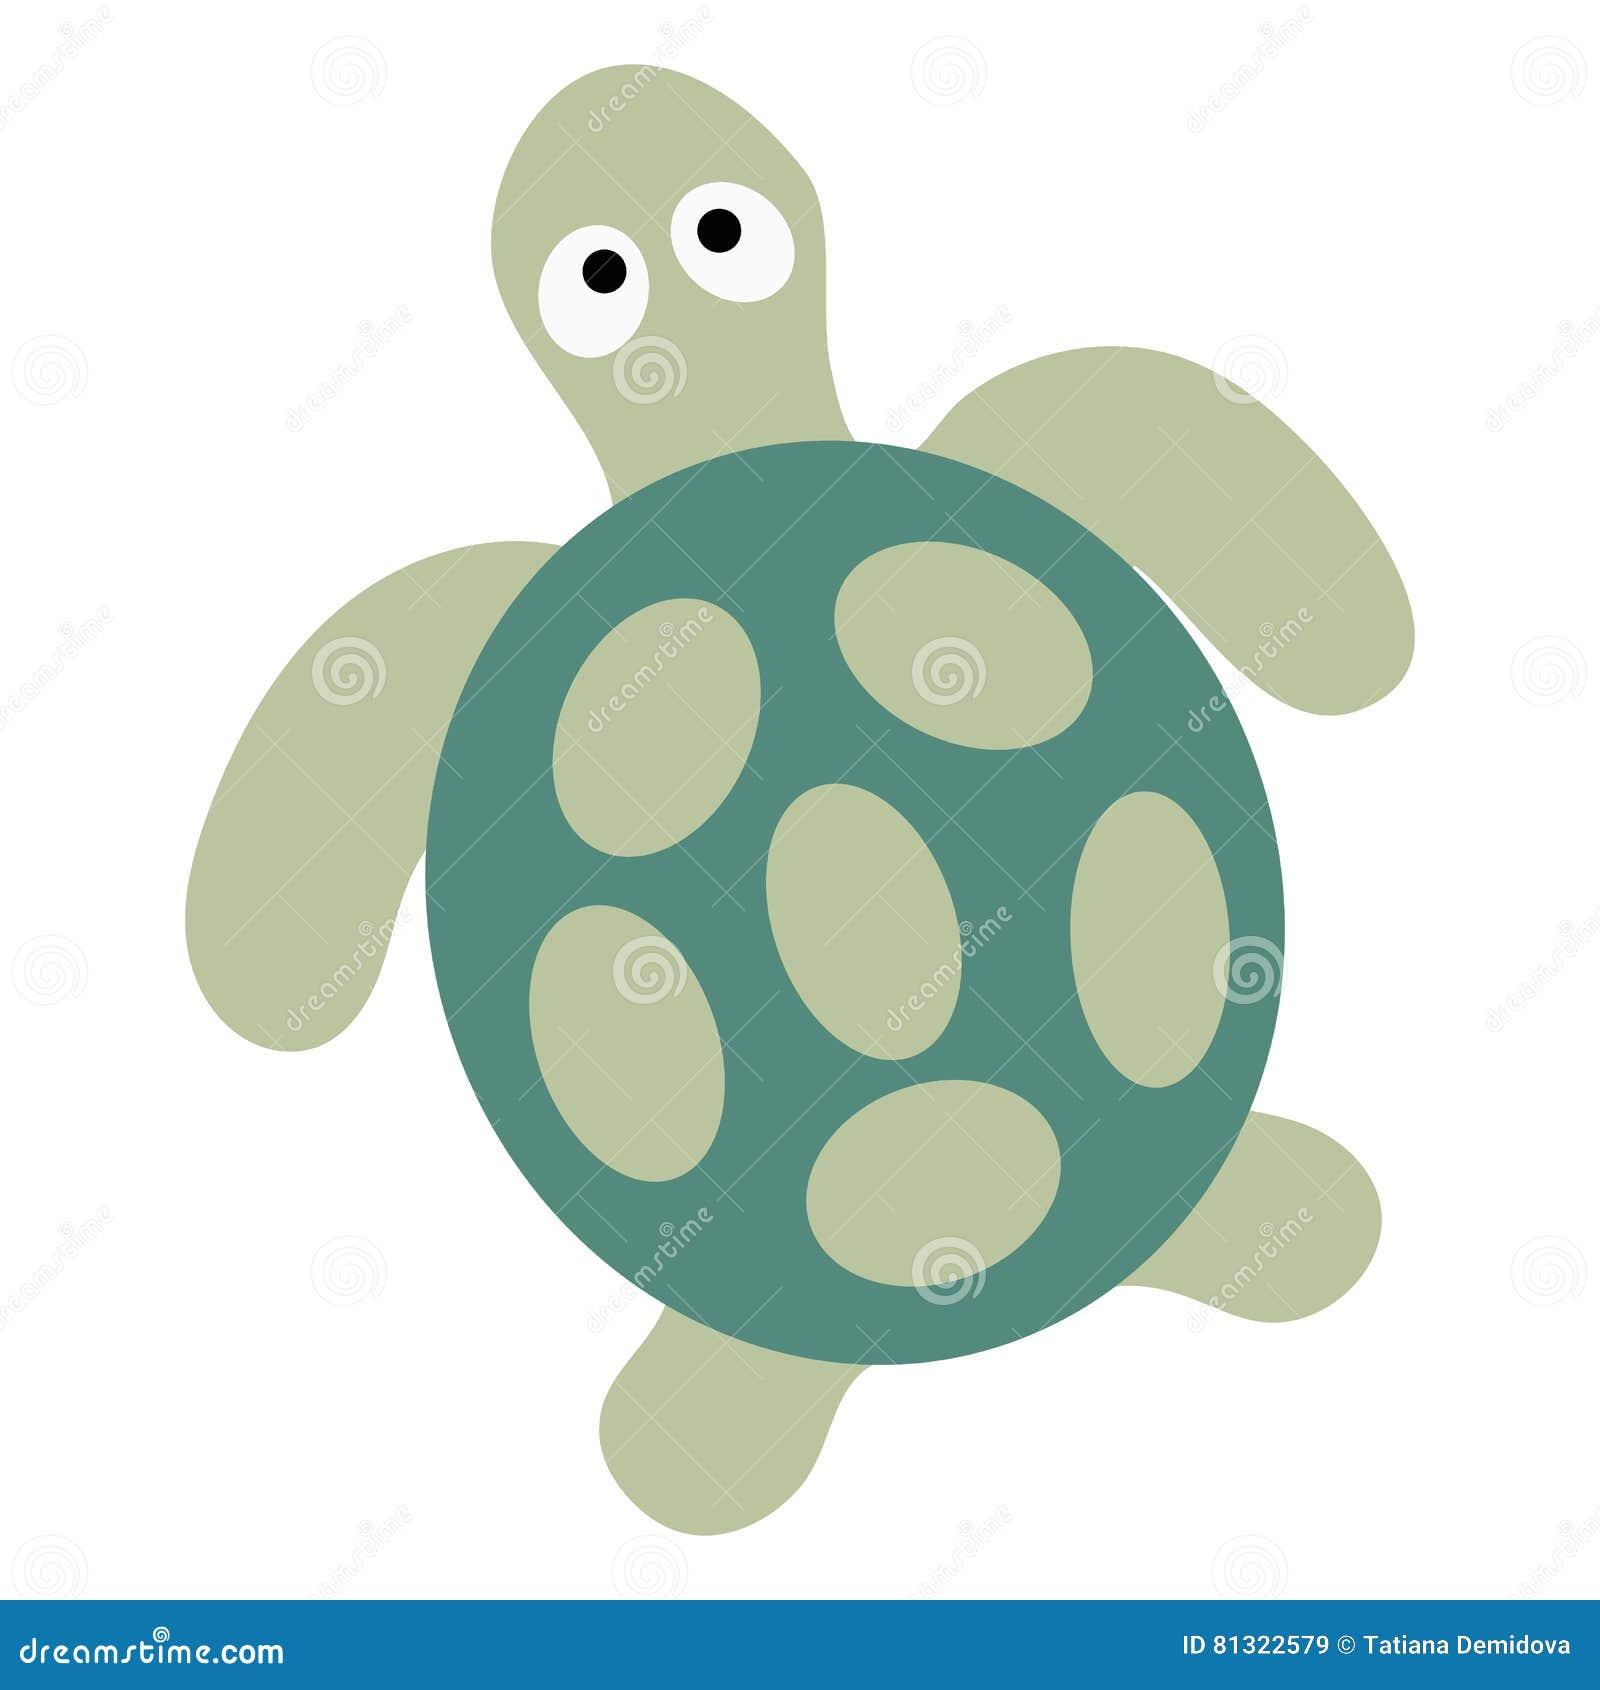 Asombroso Tortuga Bebé Para Colorear Elaboración - Enmarcado Para ...